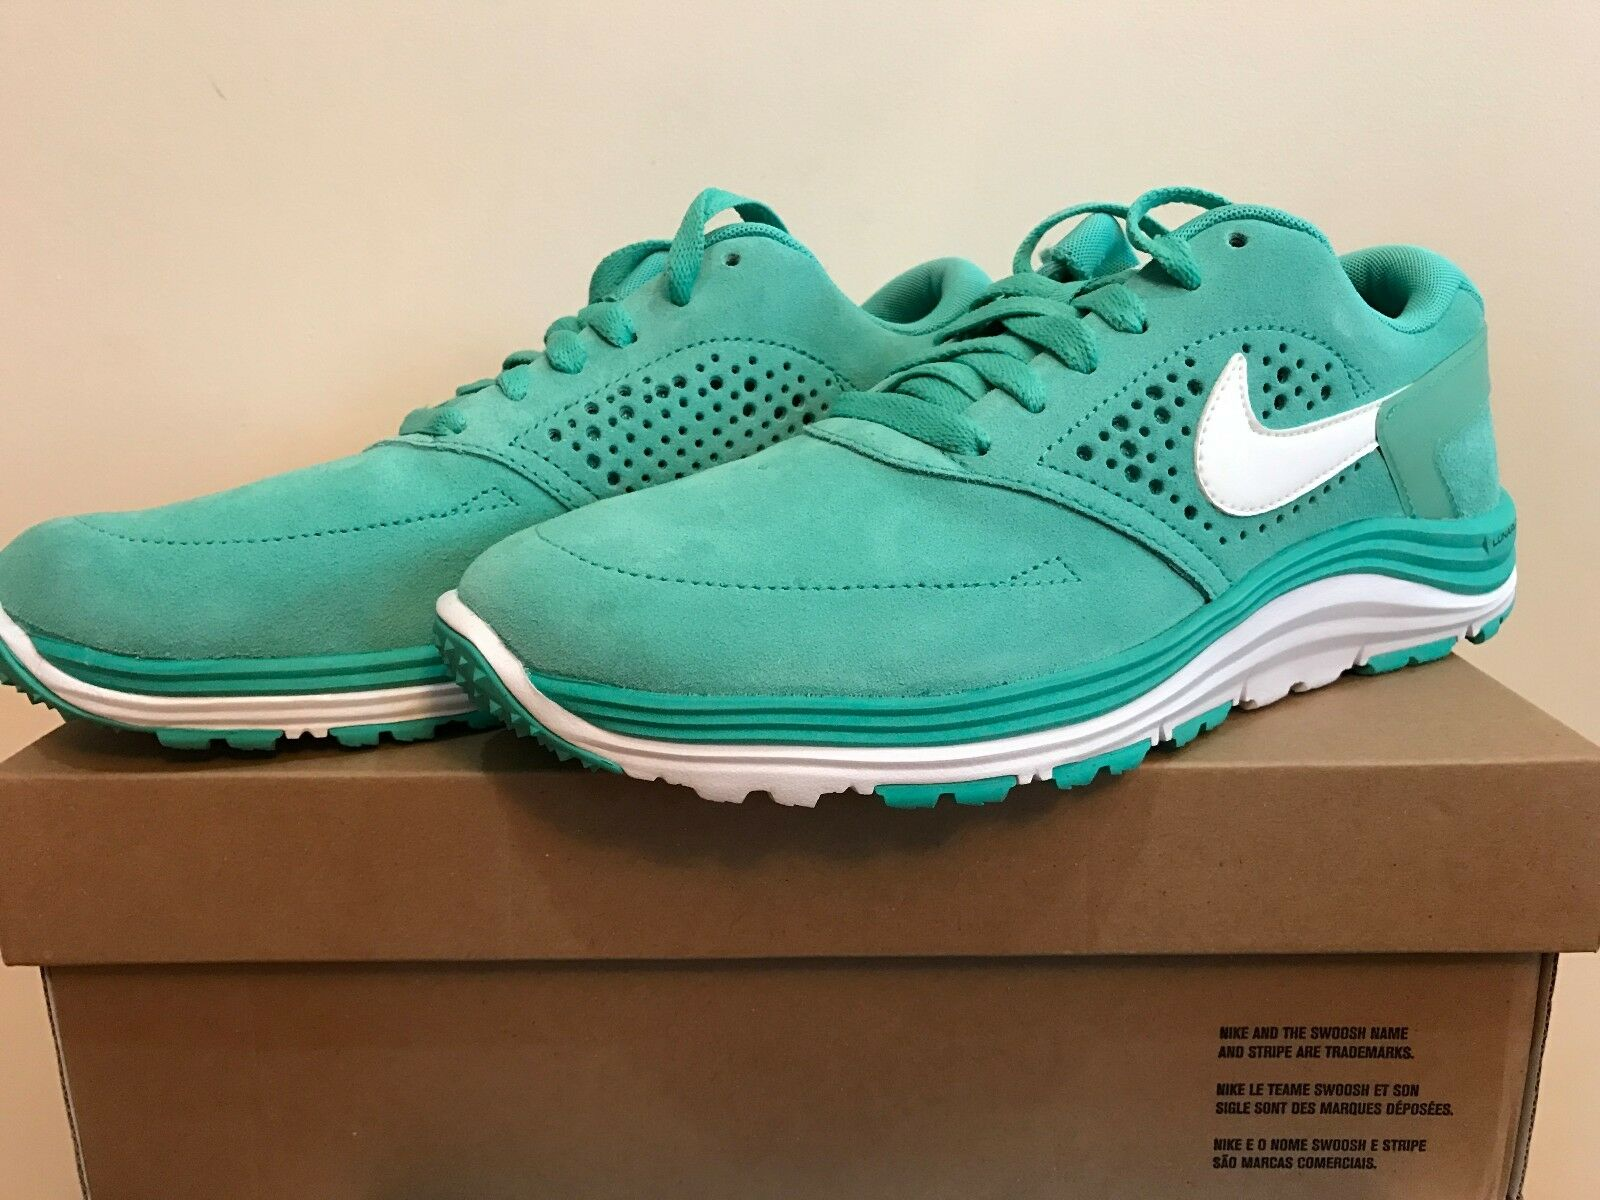 Nike lunar rod mint / white dimensioni dimensioni dimensioni 7,5 a pattinare scarpa a8c9de